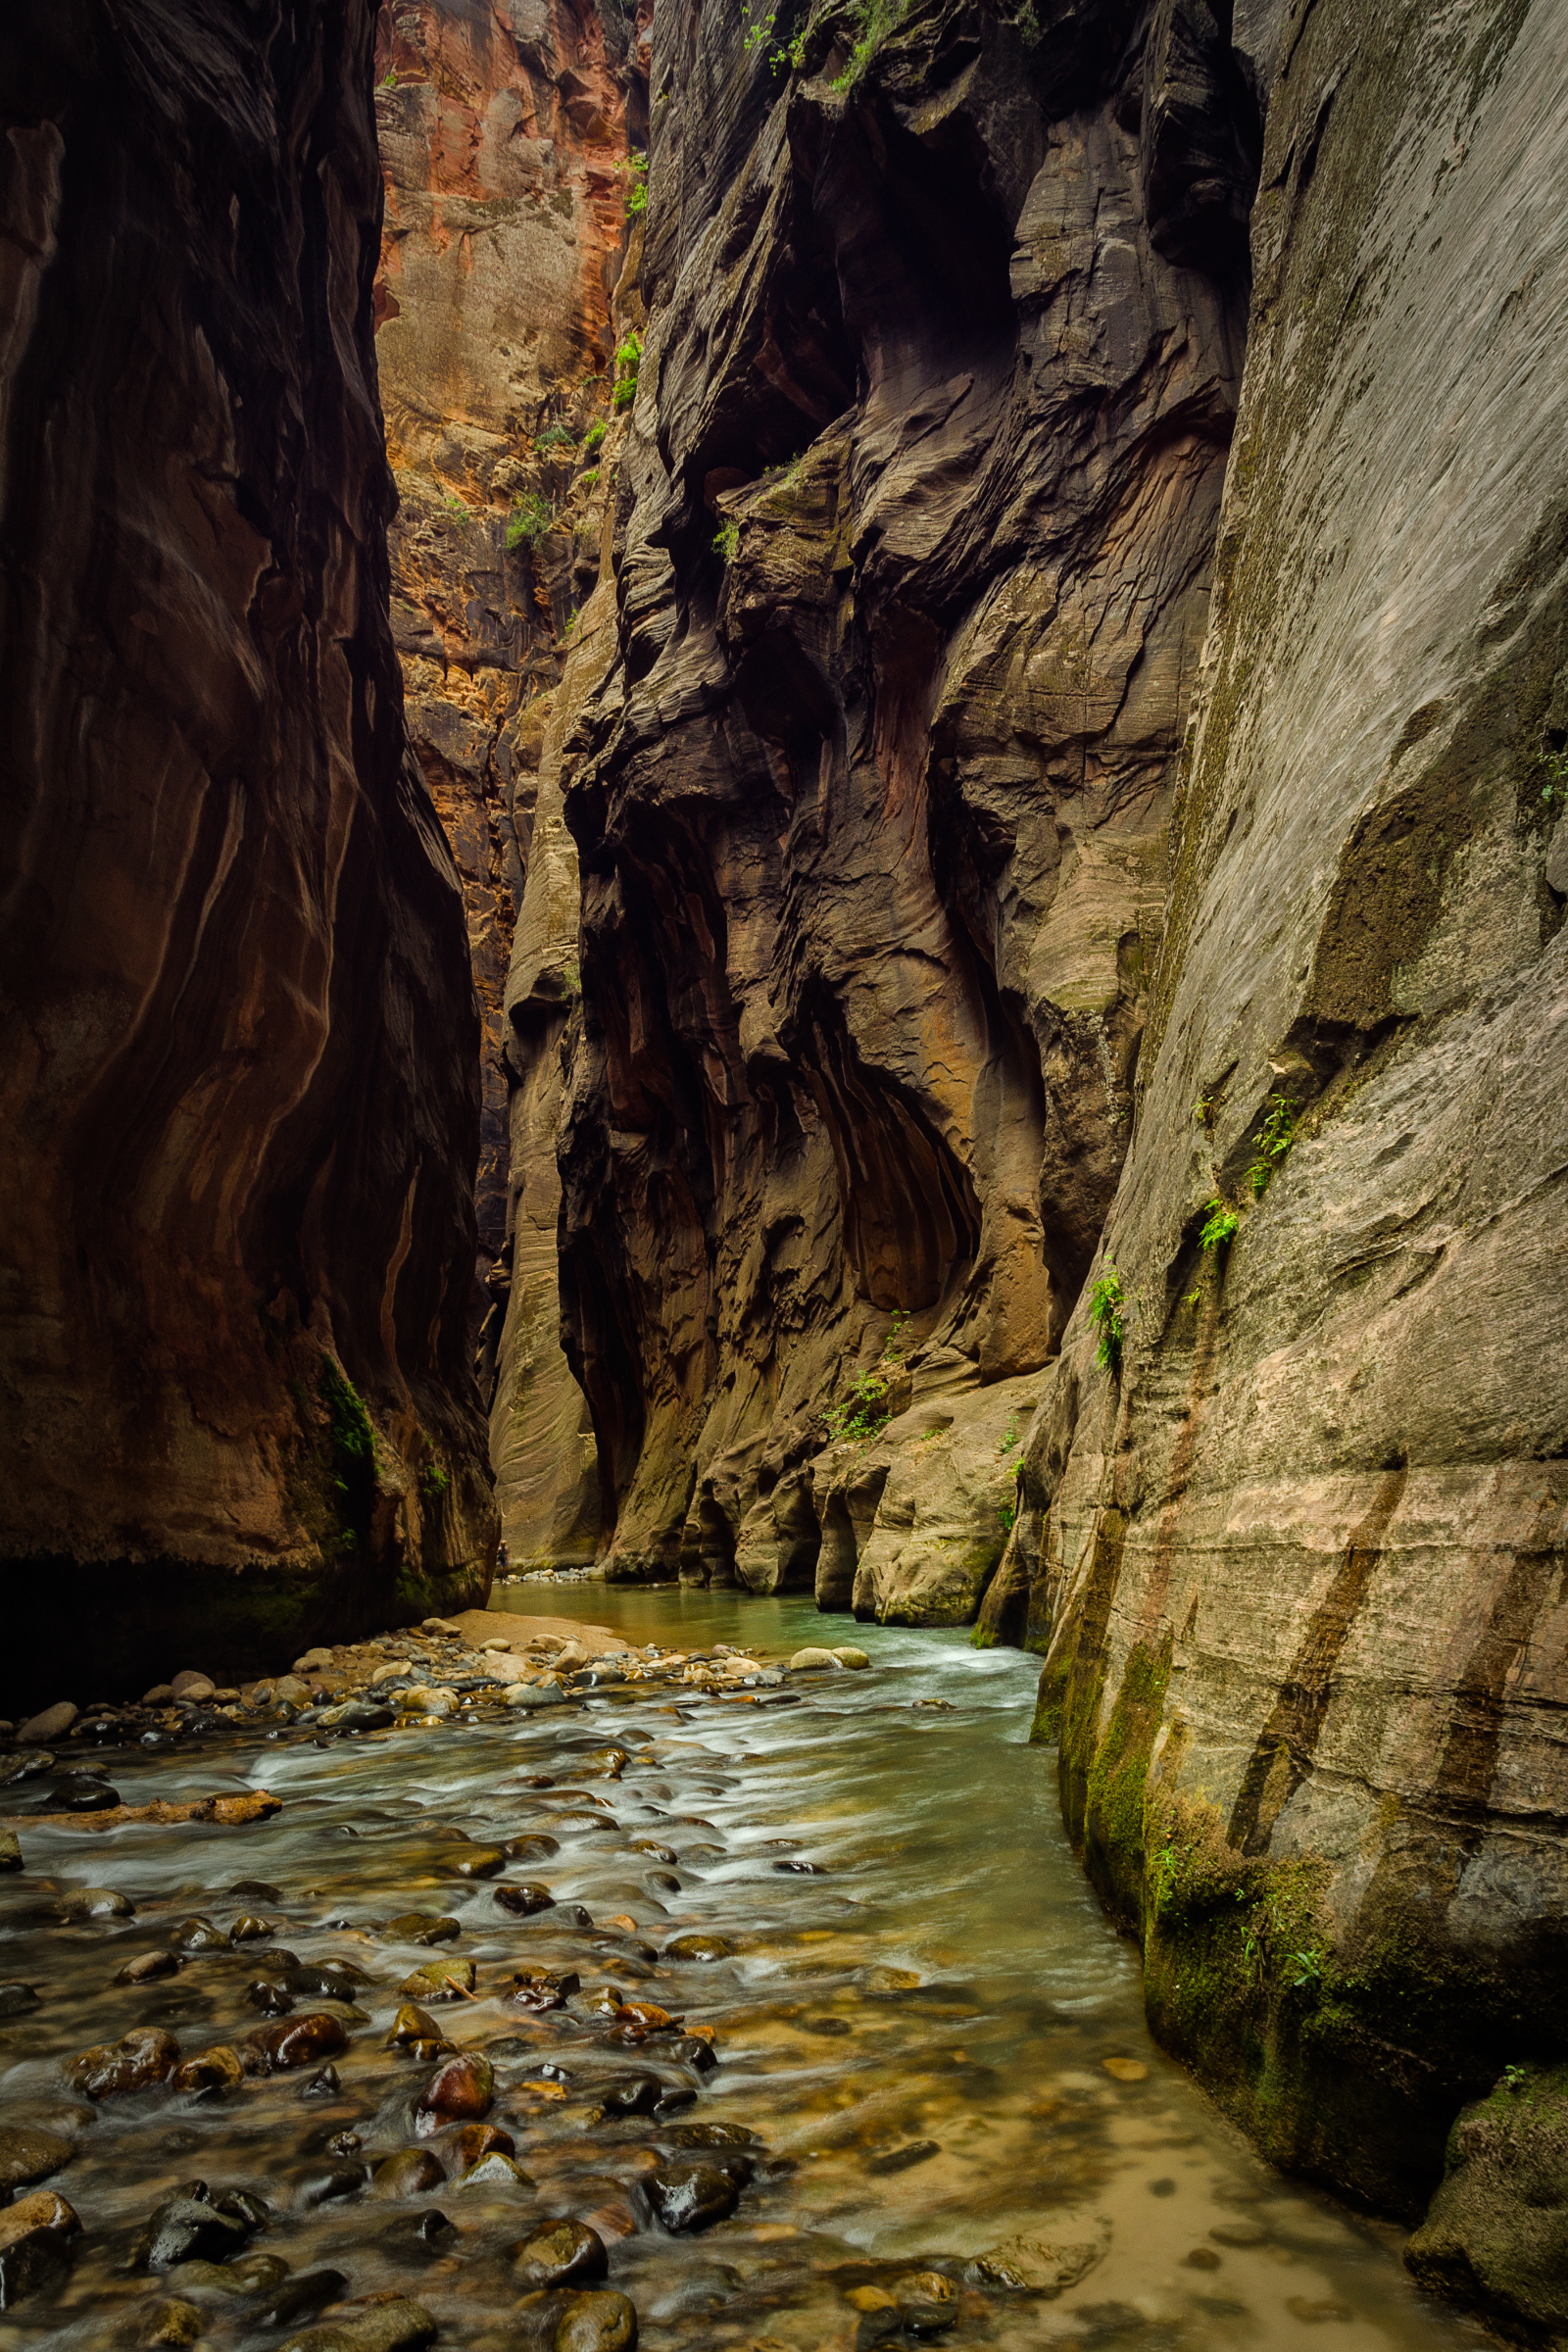 The Narrows. Wall Street. Zion National Park, Utah. Wasim Muklashy Photography.